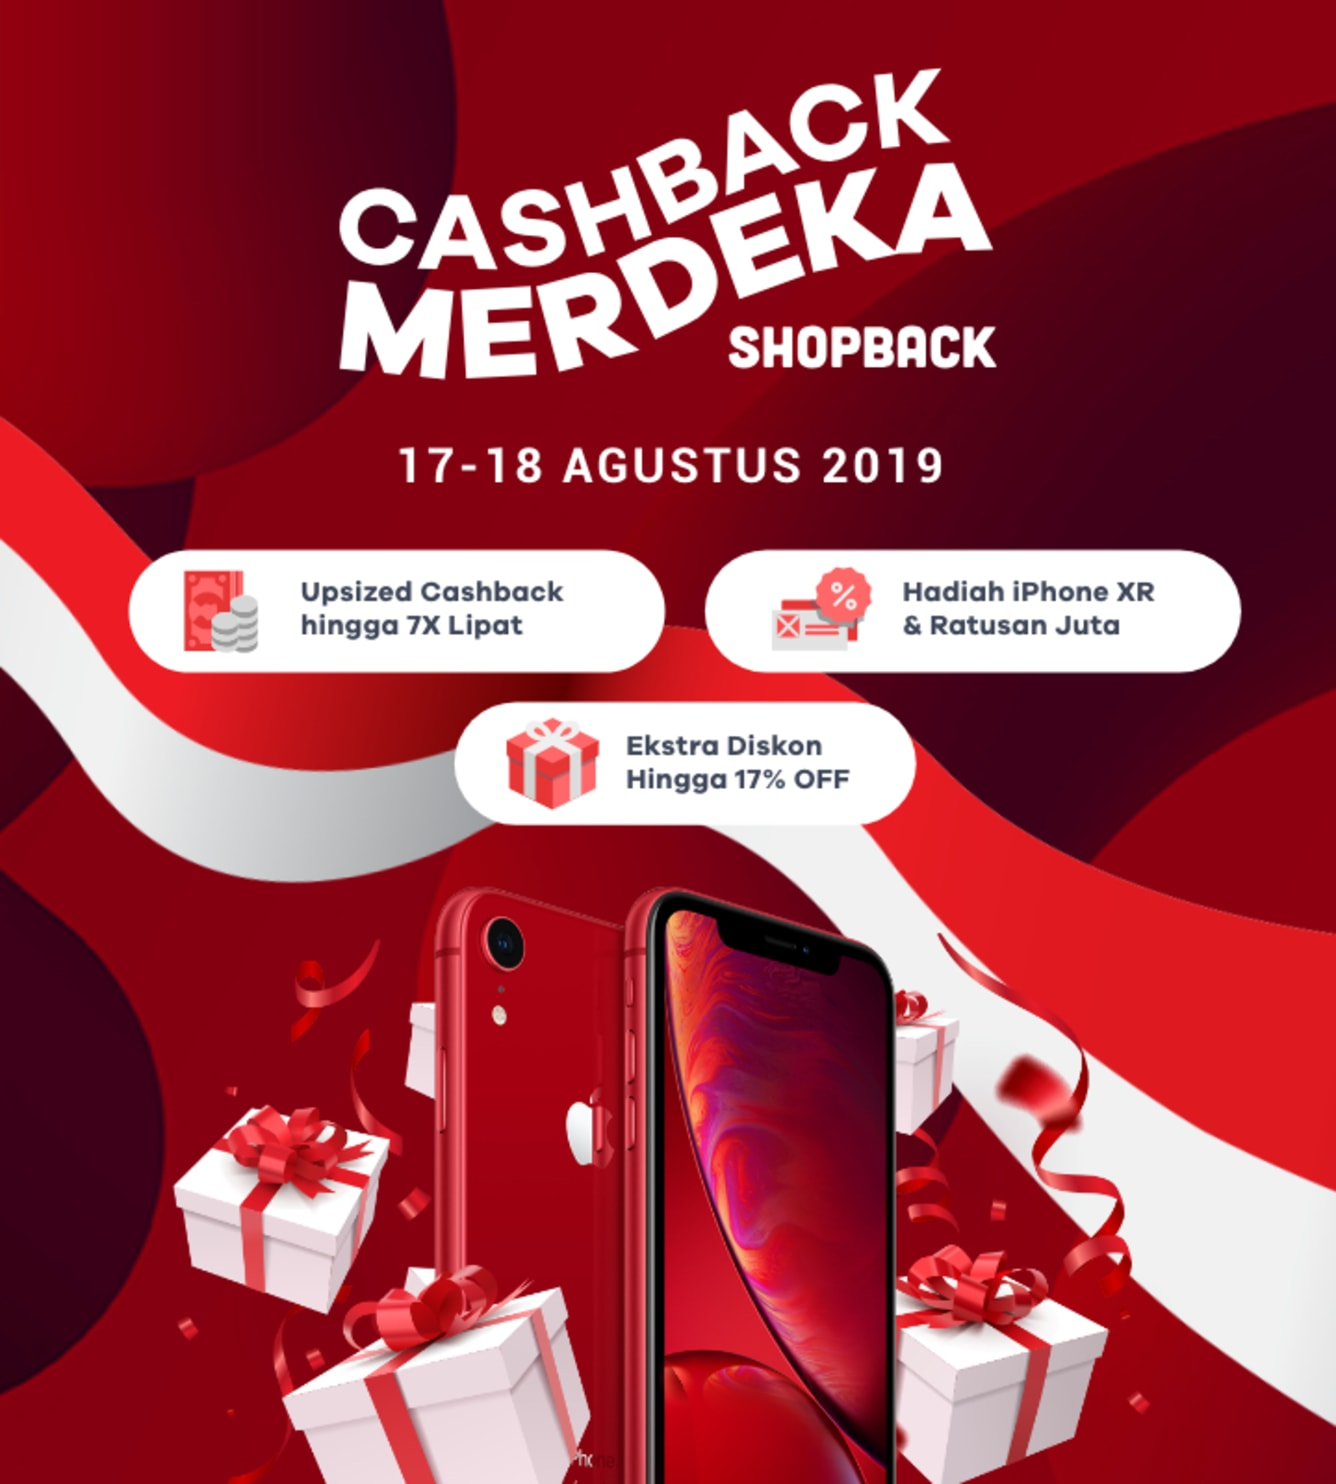 Week 33 - Promo Cashback Merdeka